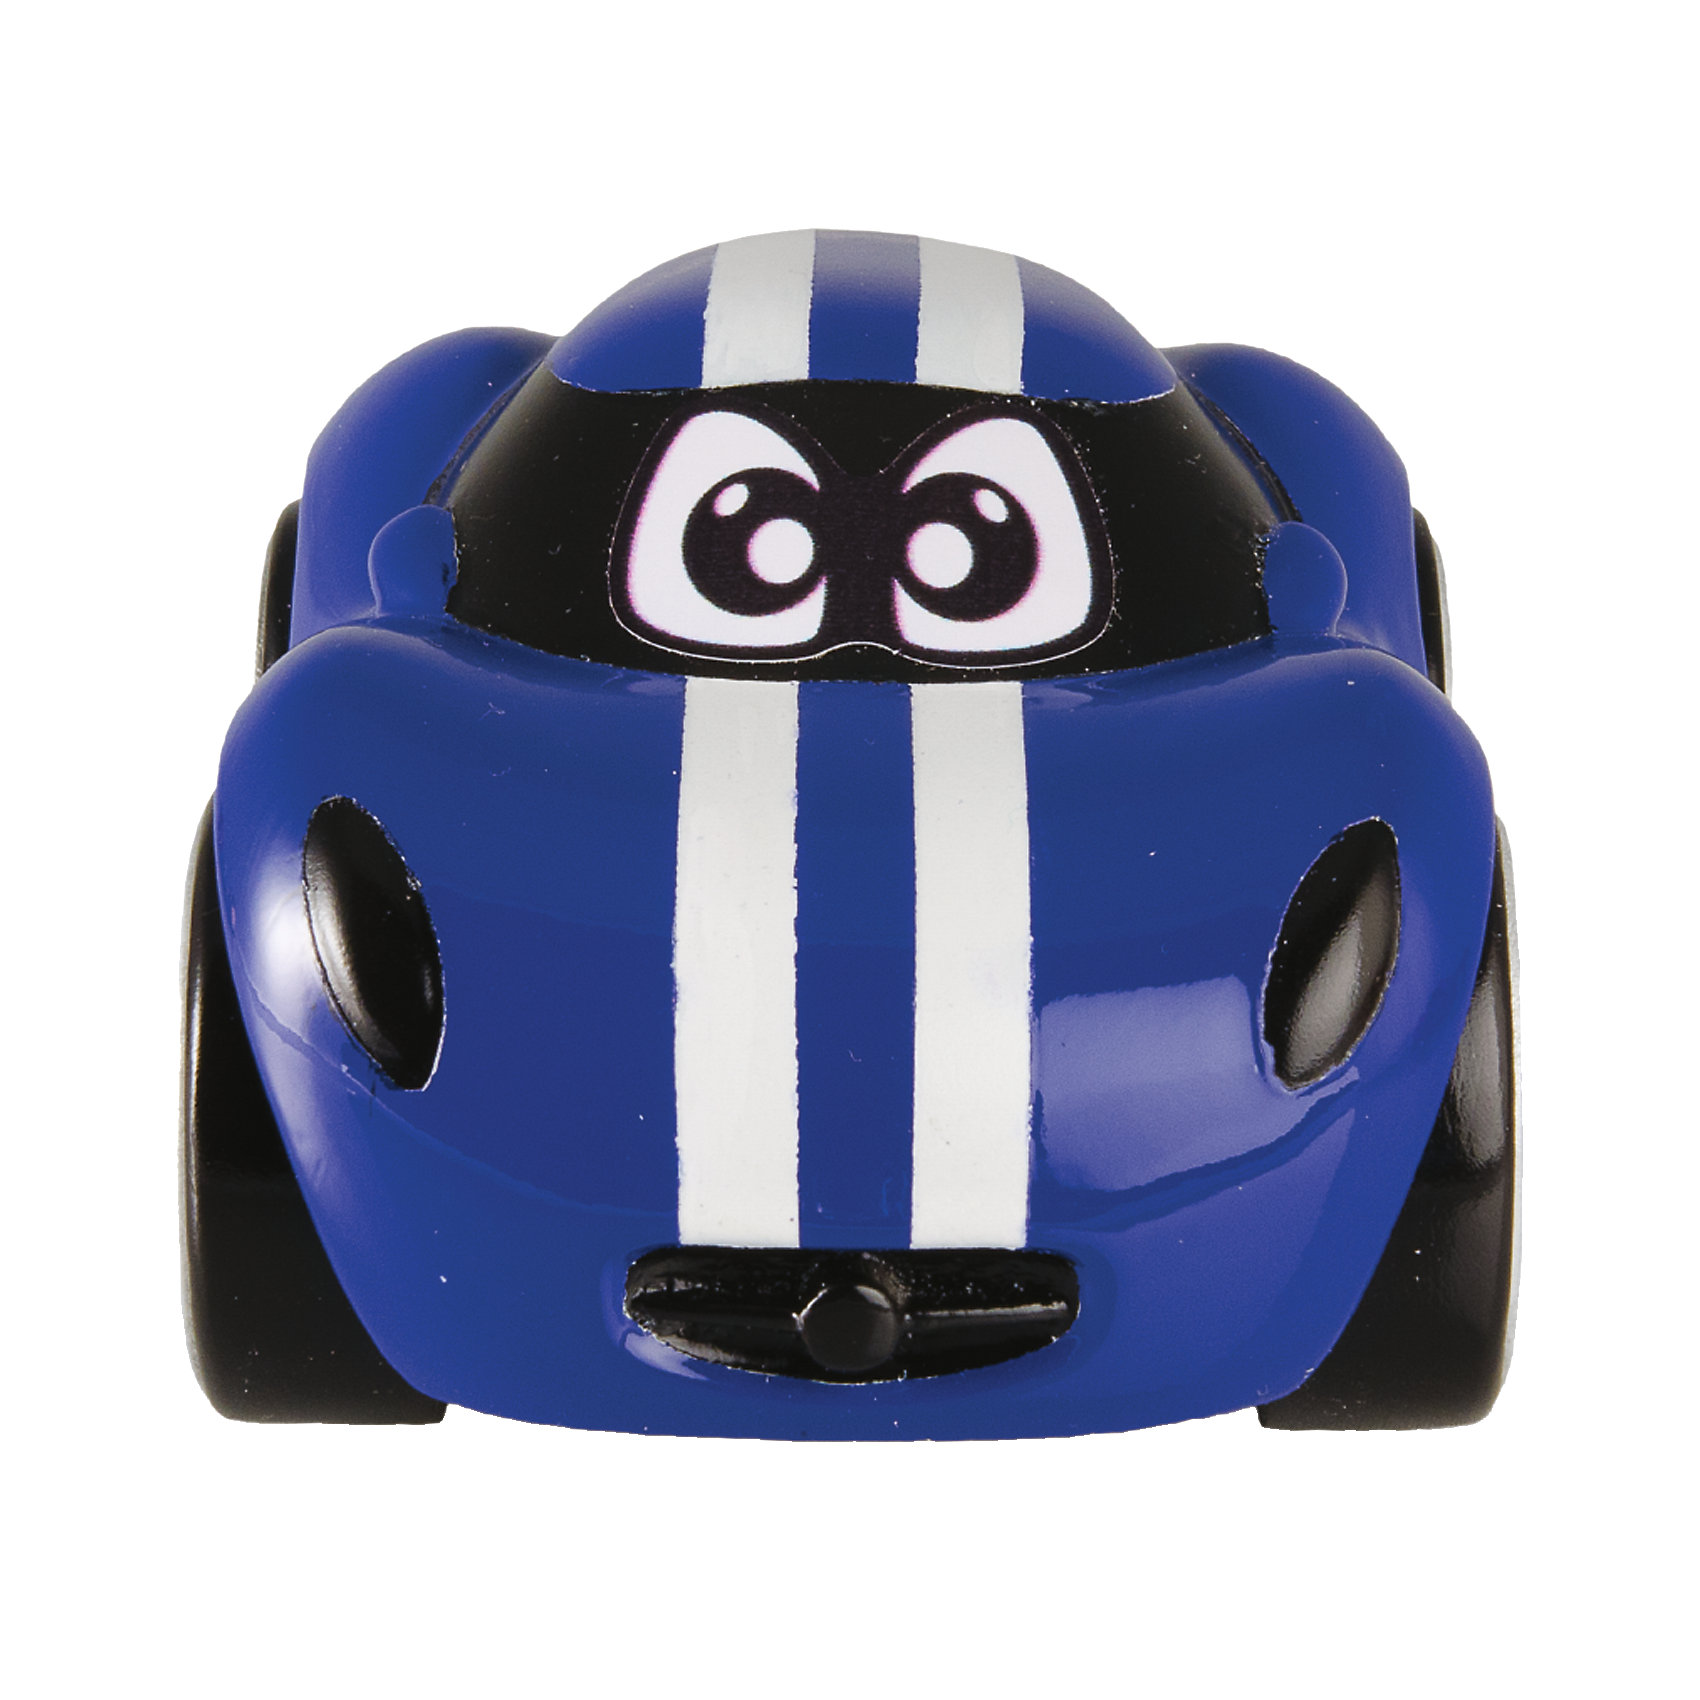 CHICCO Мини-машинка Turbo Touch Donnie Stunt, синяя, Chicco интерактивная игрушка chicco машинка turbo touch crash от 2 лет синий 6722